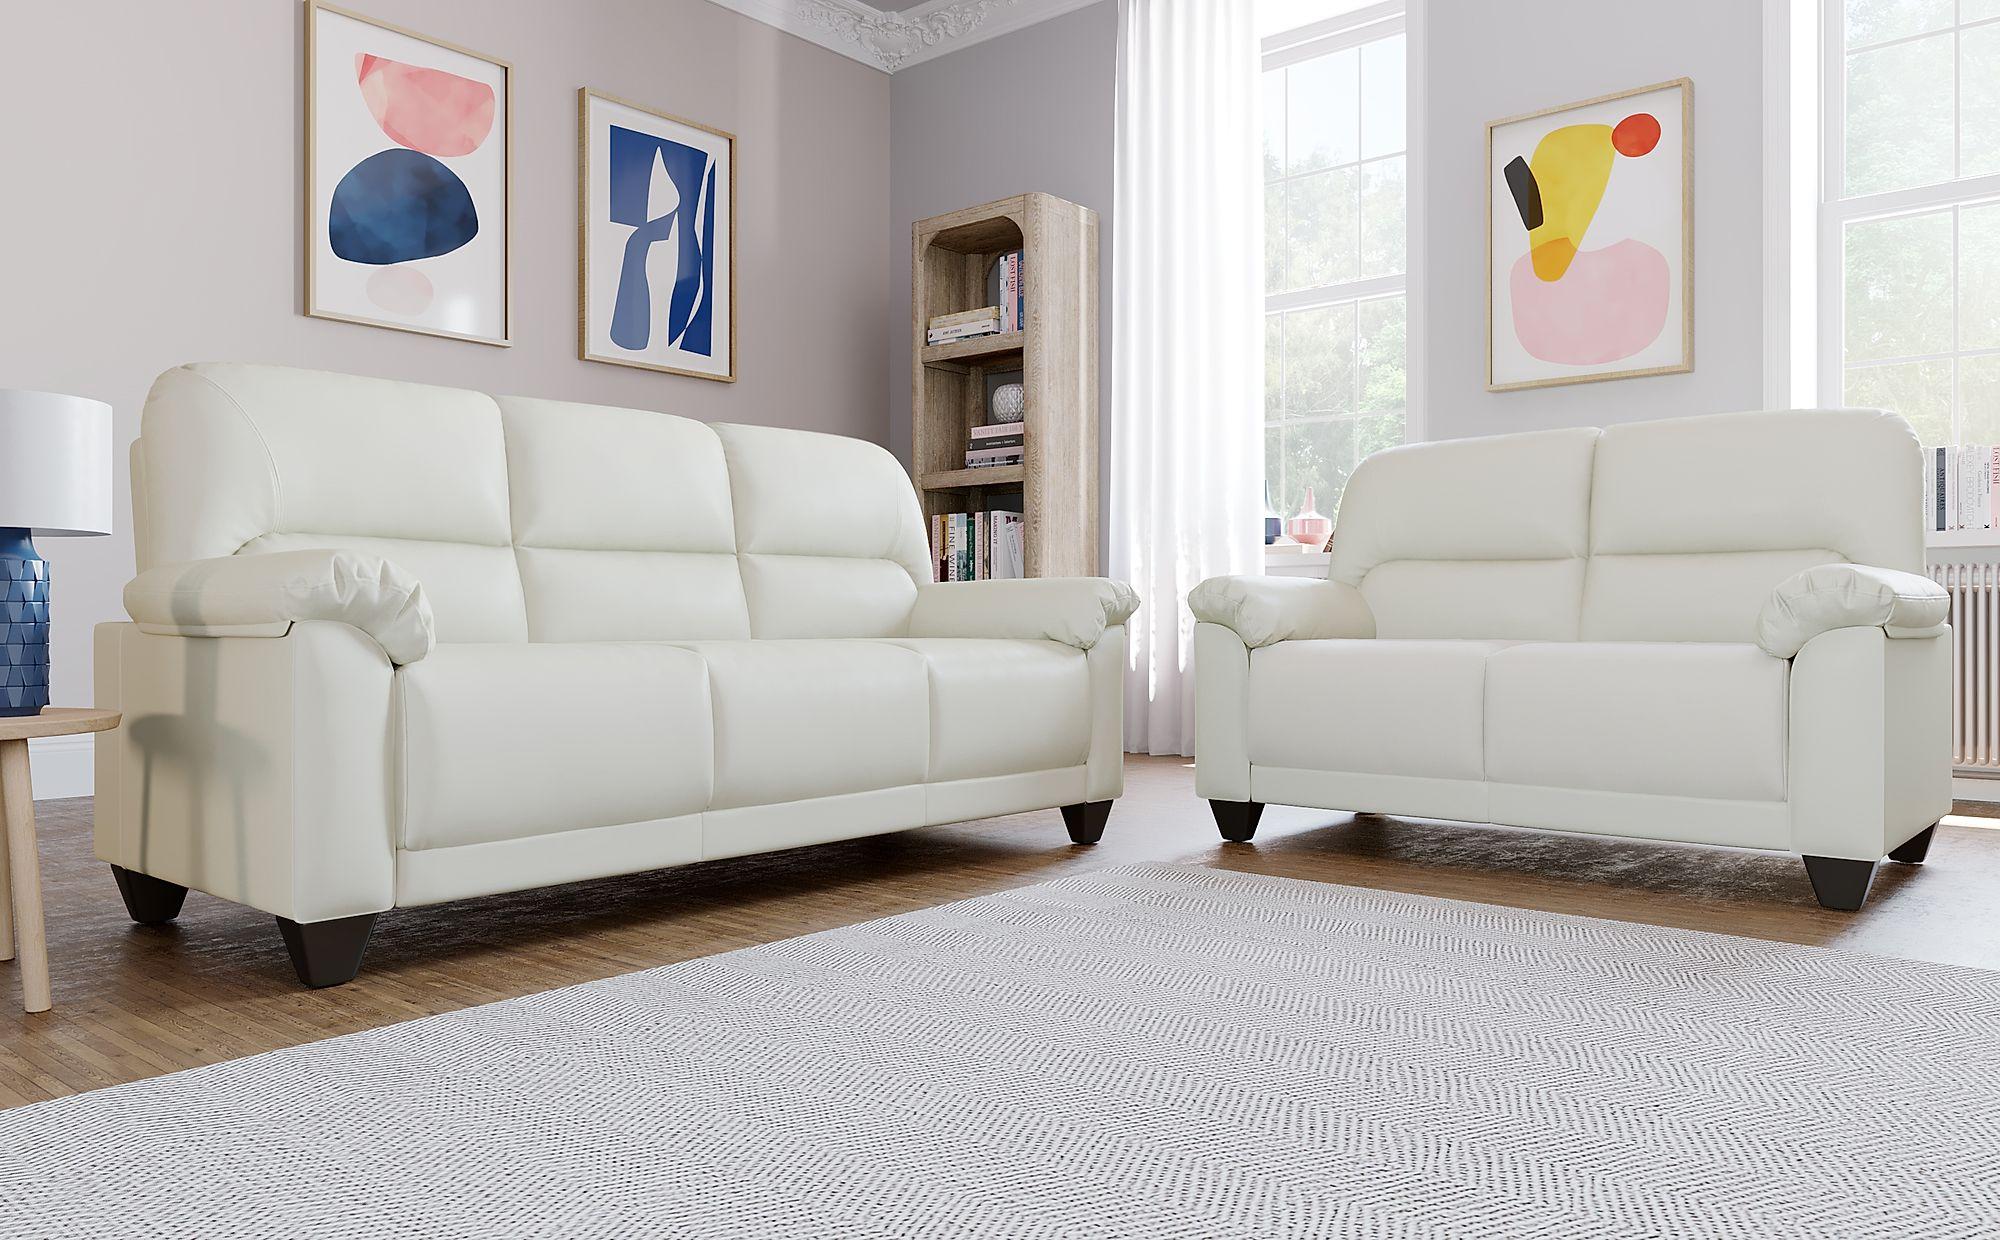 Kenton Small Ivory Leather 3+2 Seater Sofa Set | Furniture ...